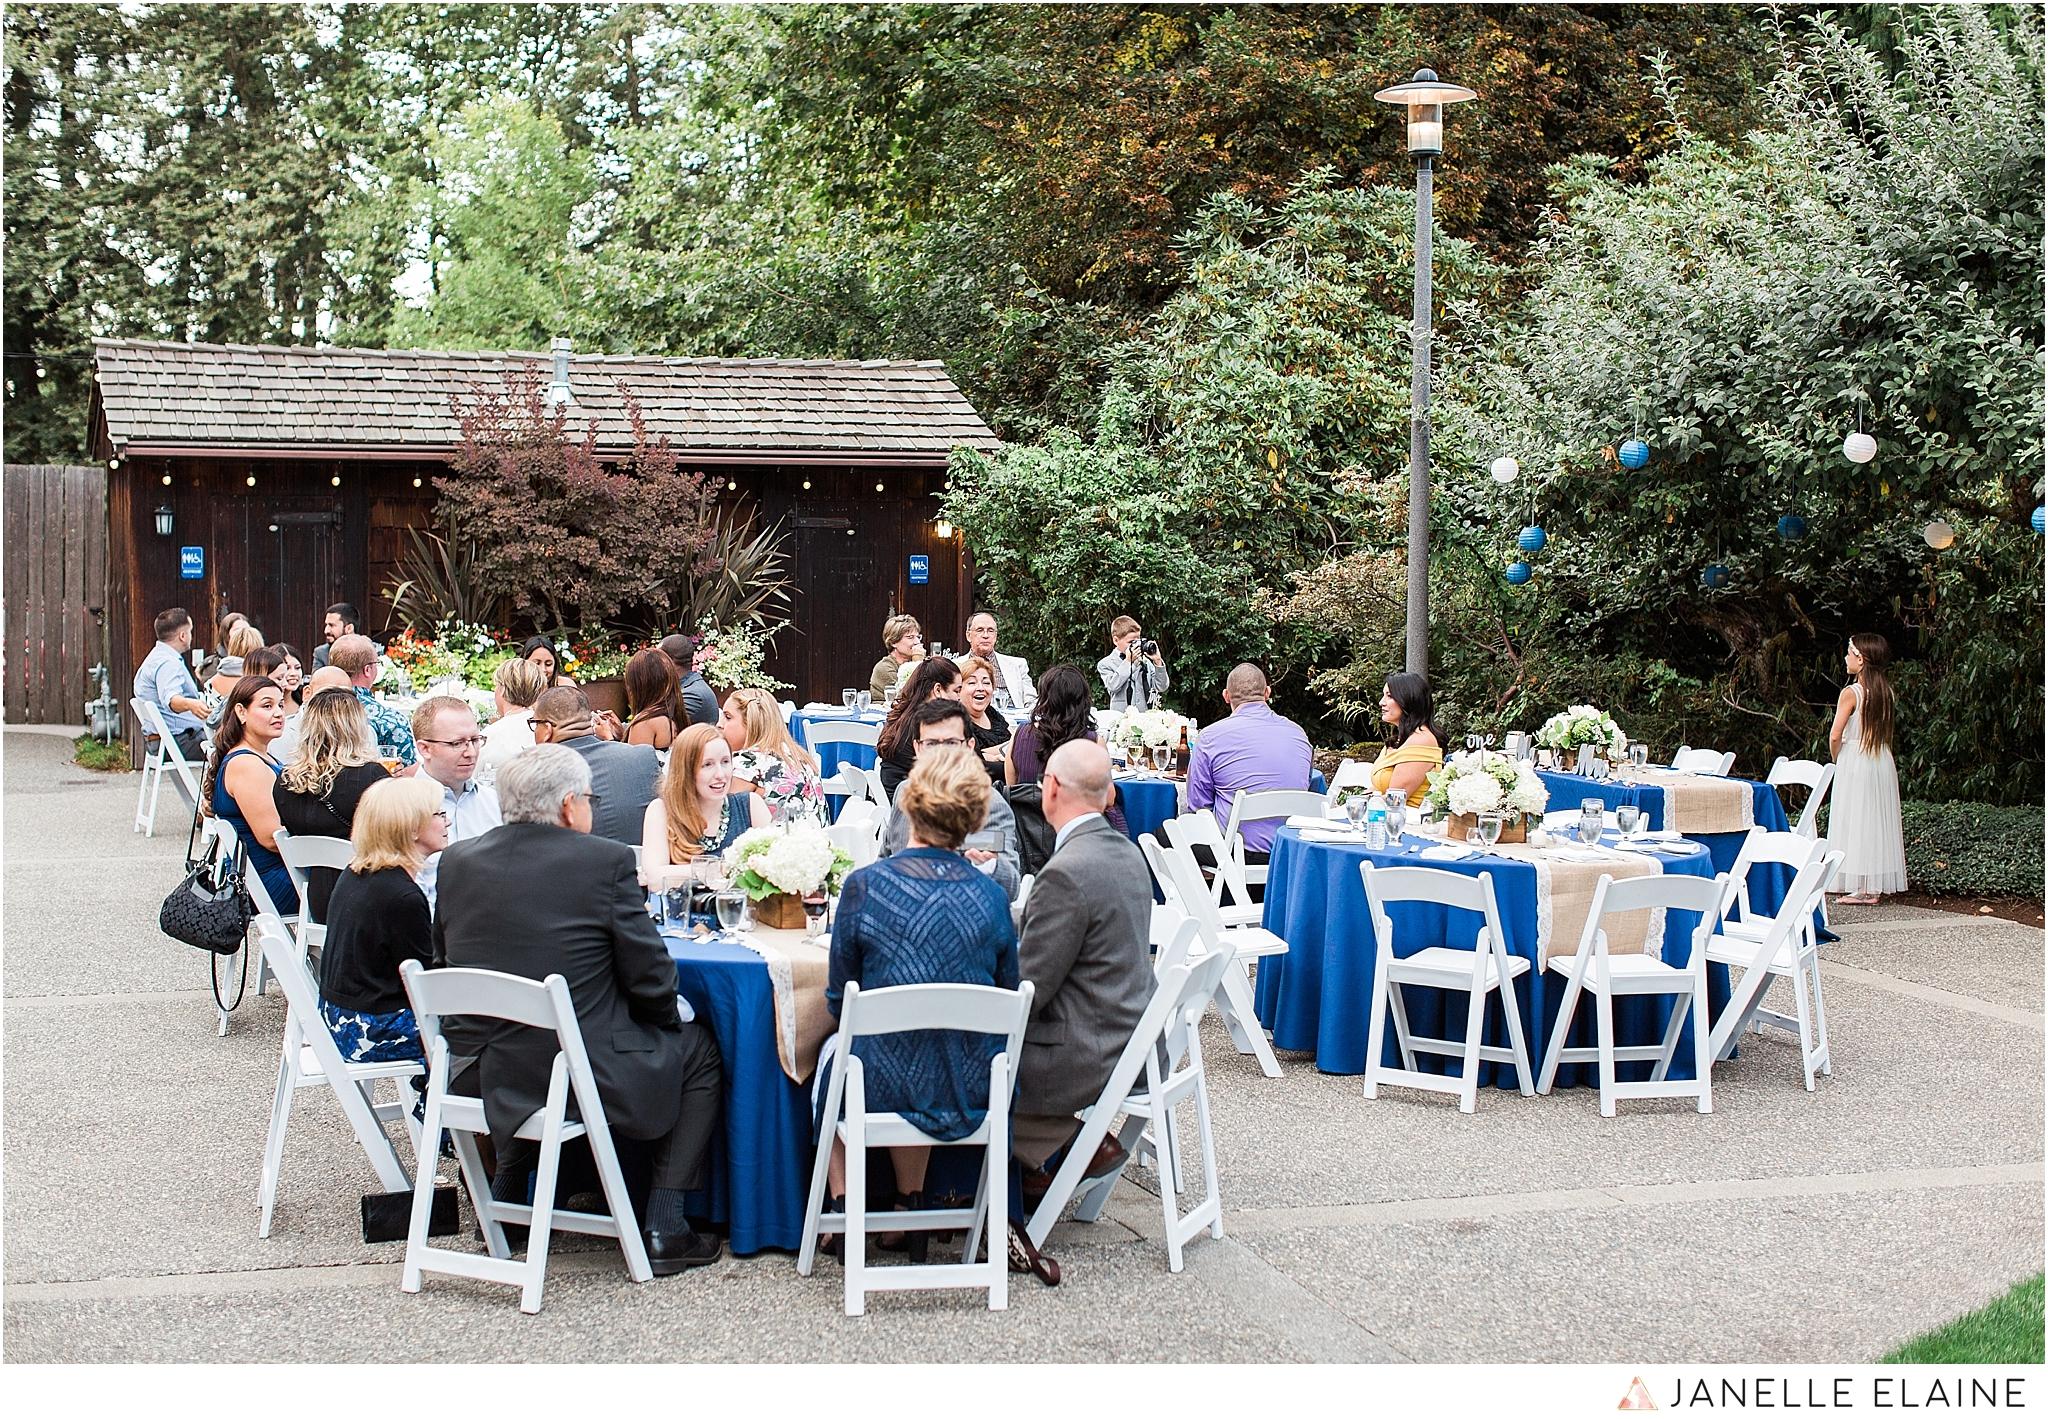 janelle elaine photography-professional wedding photographer-seattle-bellevue-robinswood house-247.jpg